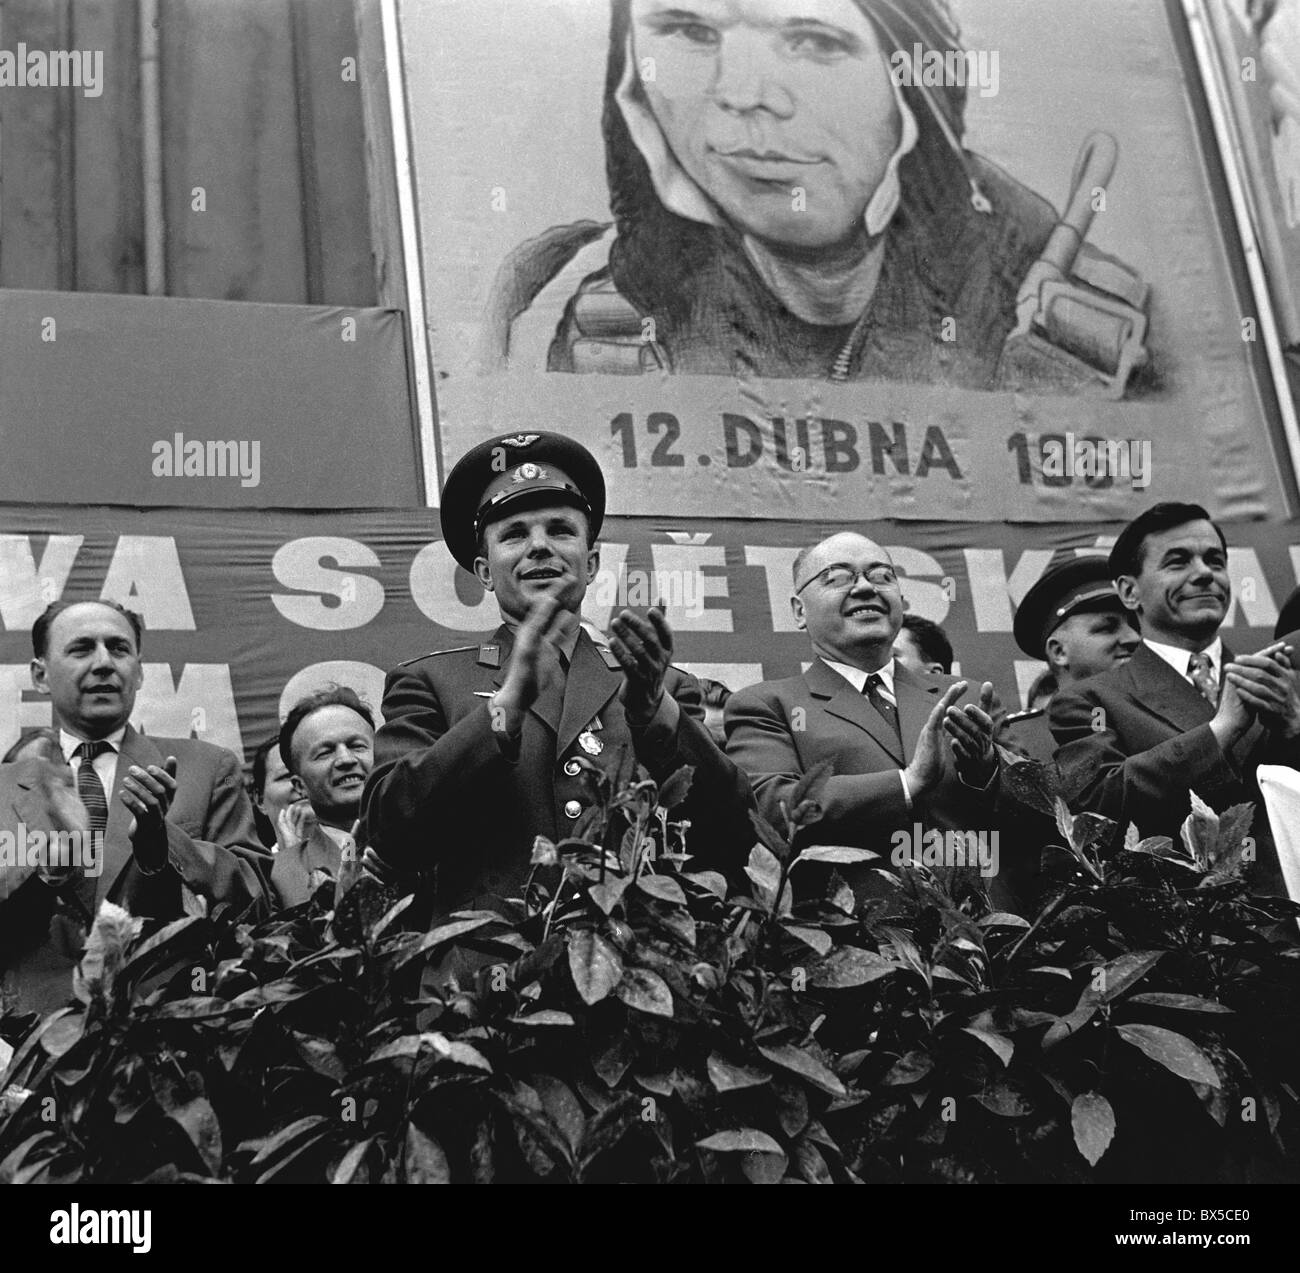 cosmonaut Yuri Gagarin, workers, CKD Stalingrad - Stock Image